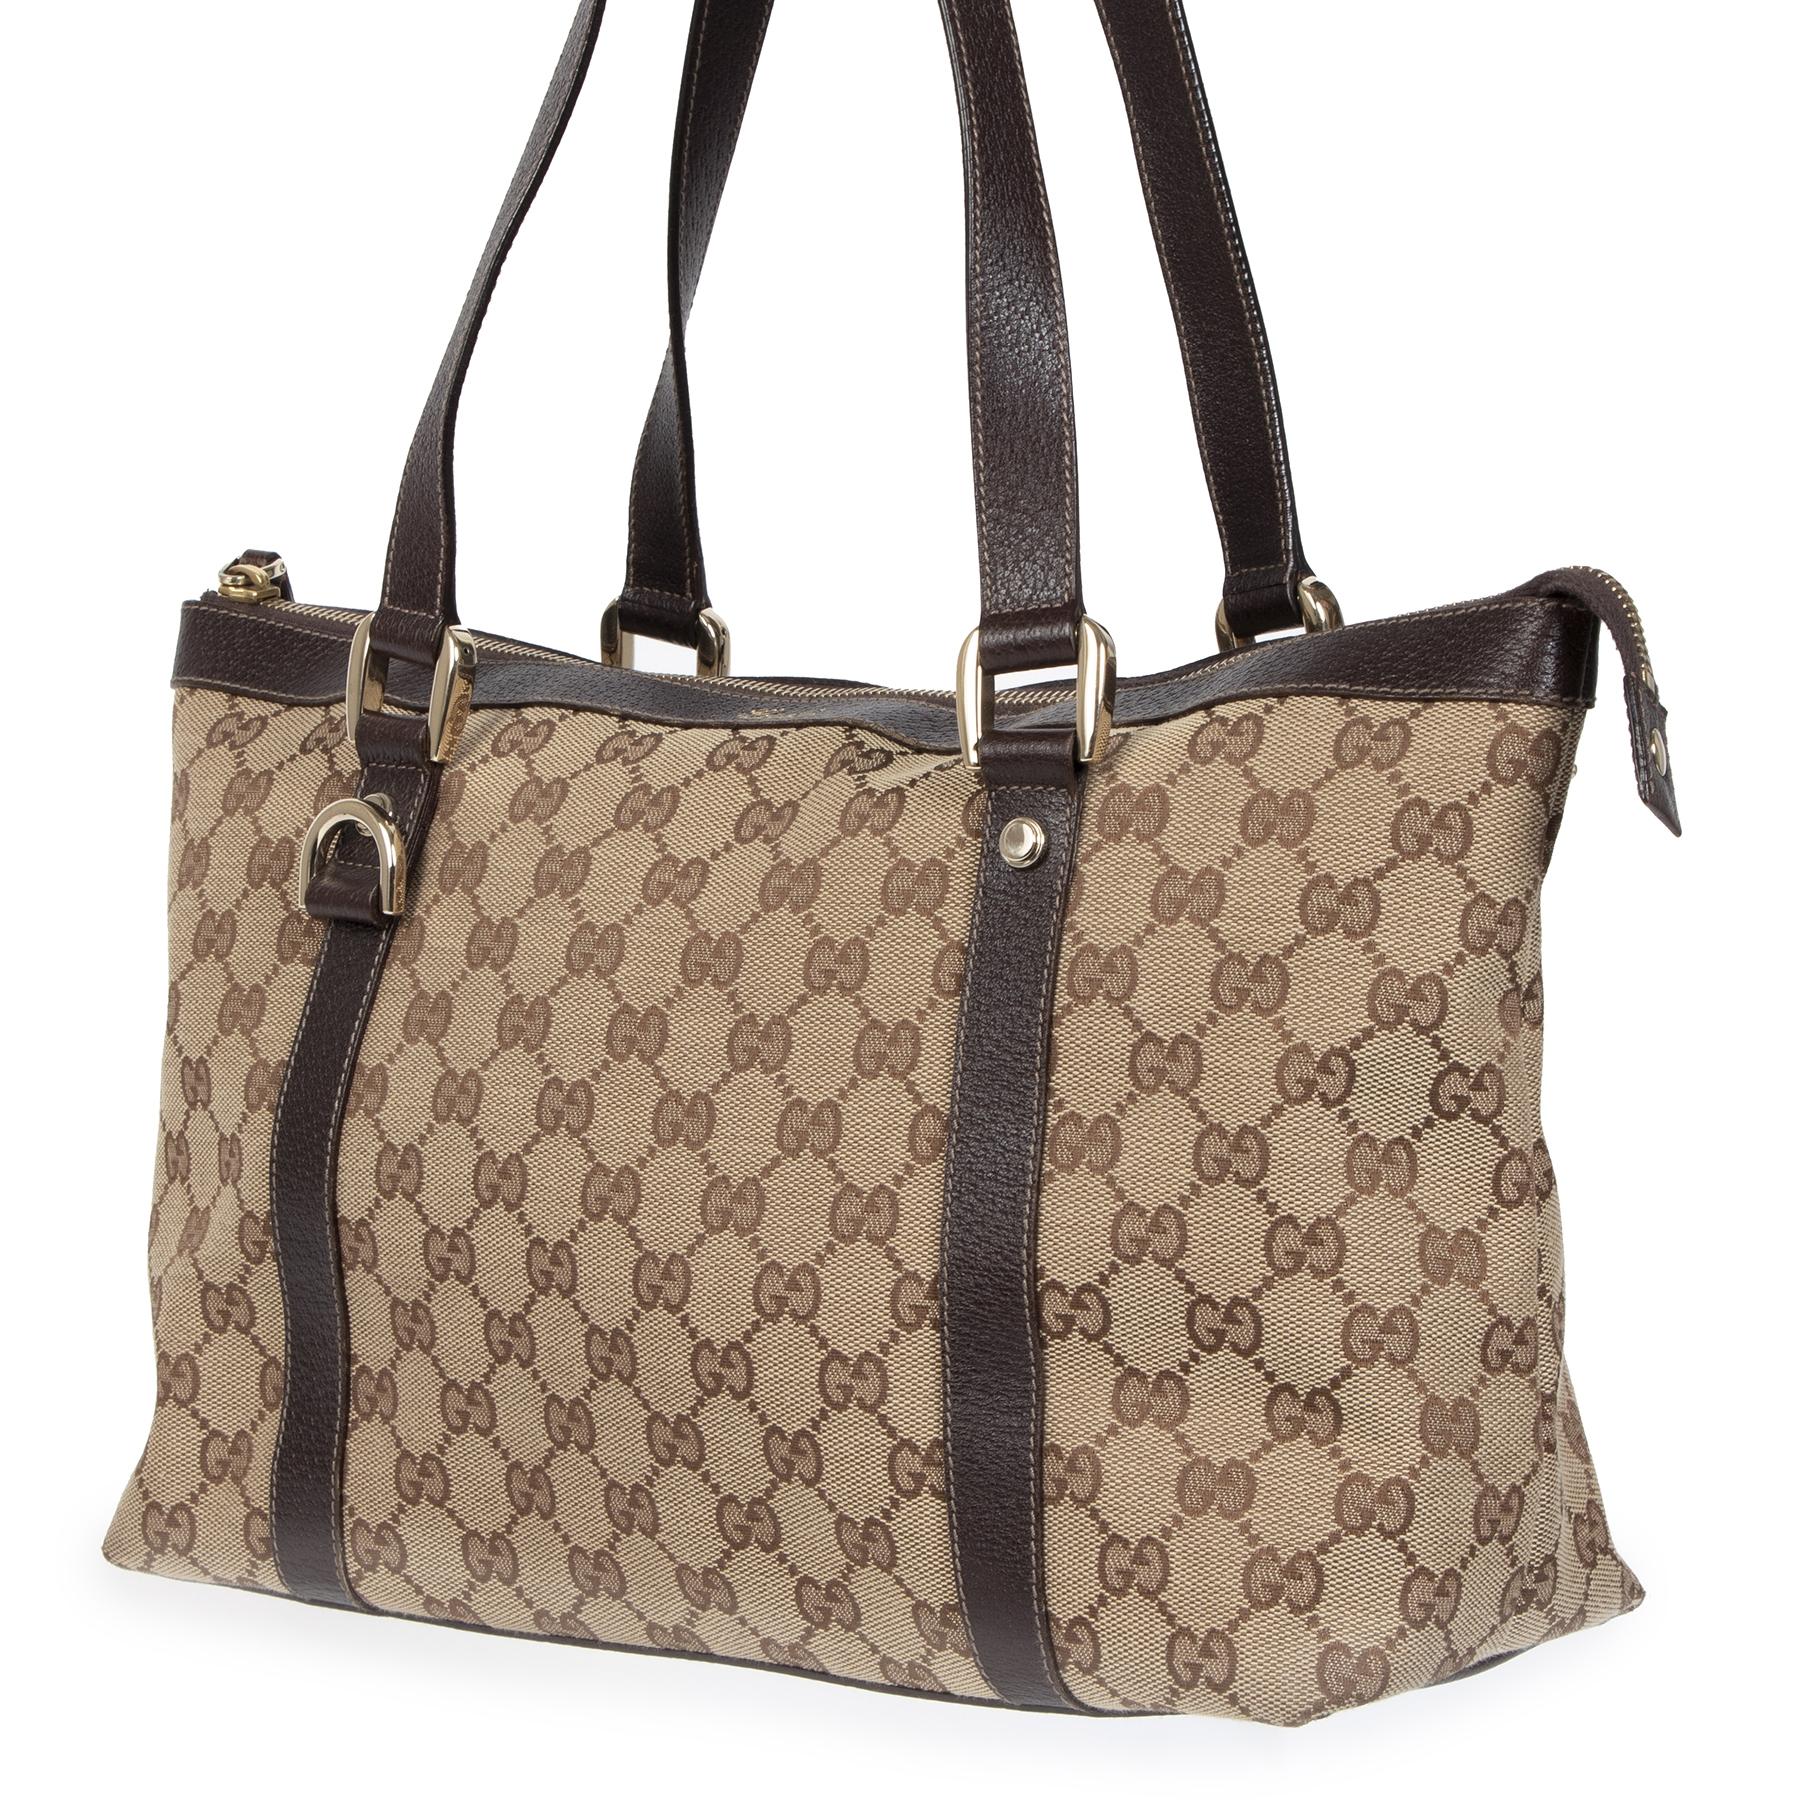 Authentieke tweedehands vintage Gucci Brown GG Shoulder Bag koop online webshop LabelLOV